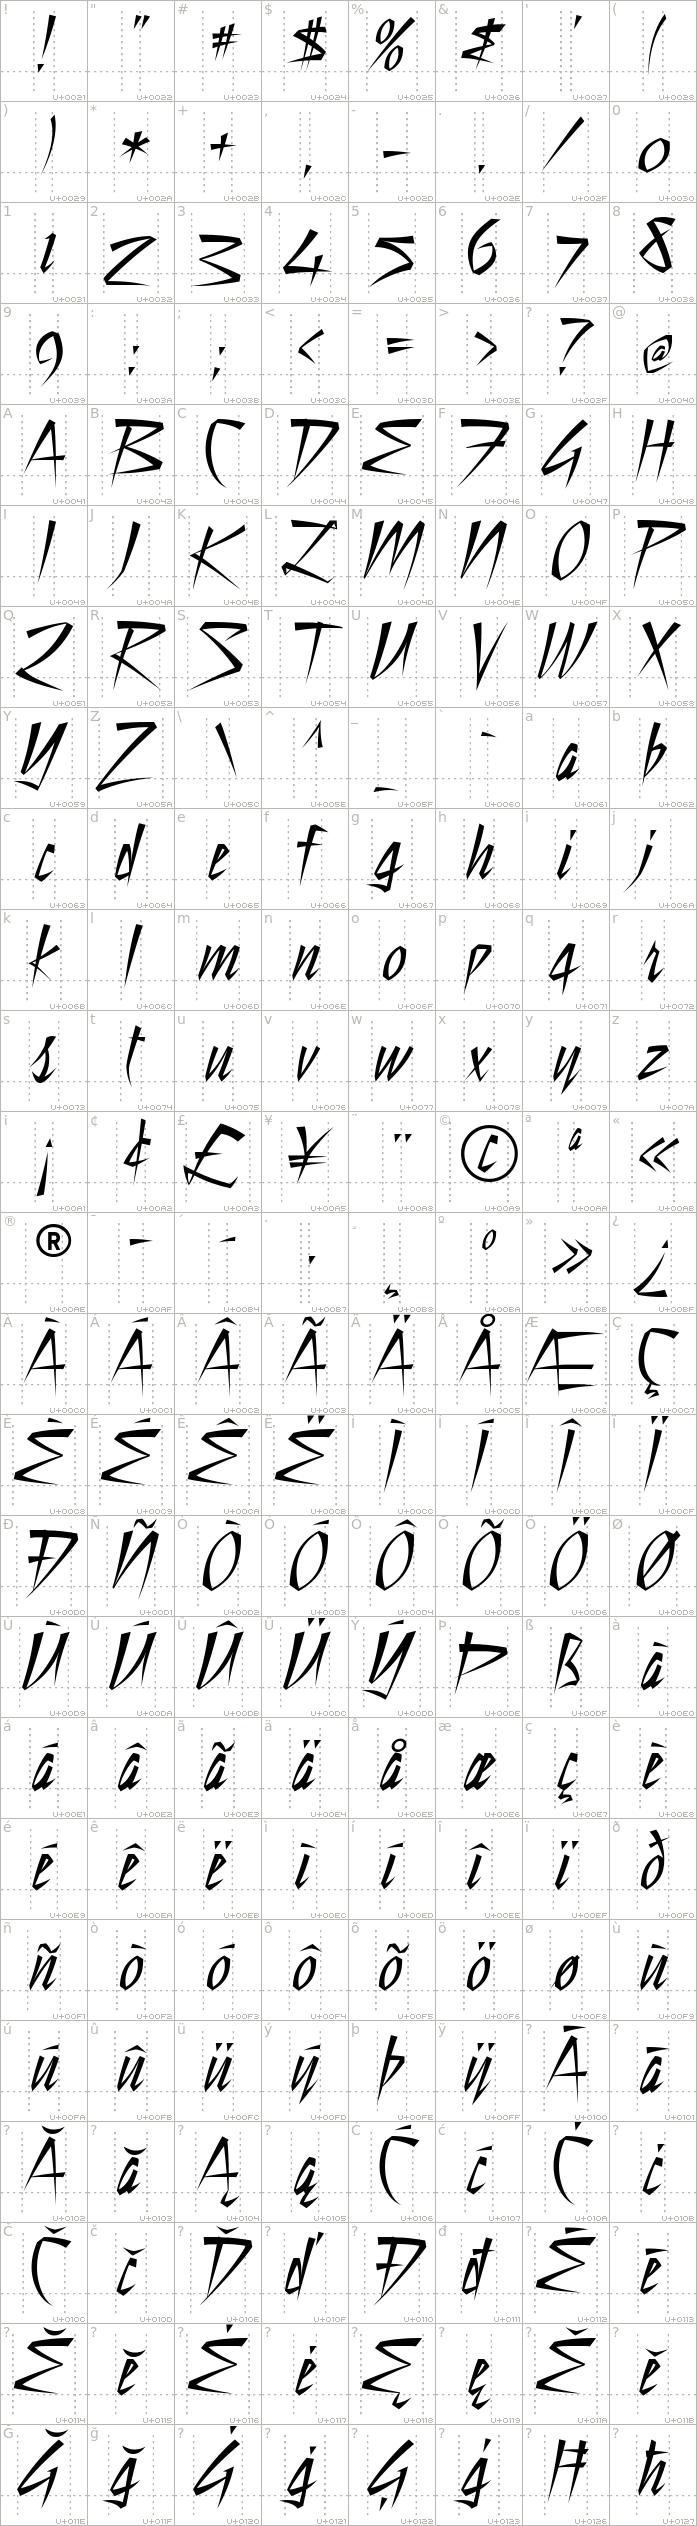 still-time.regular.character-map-1